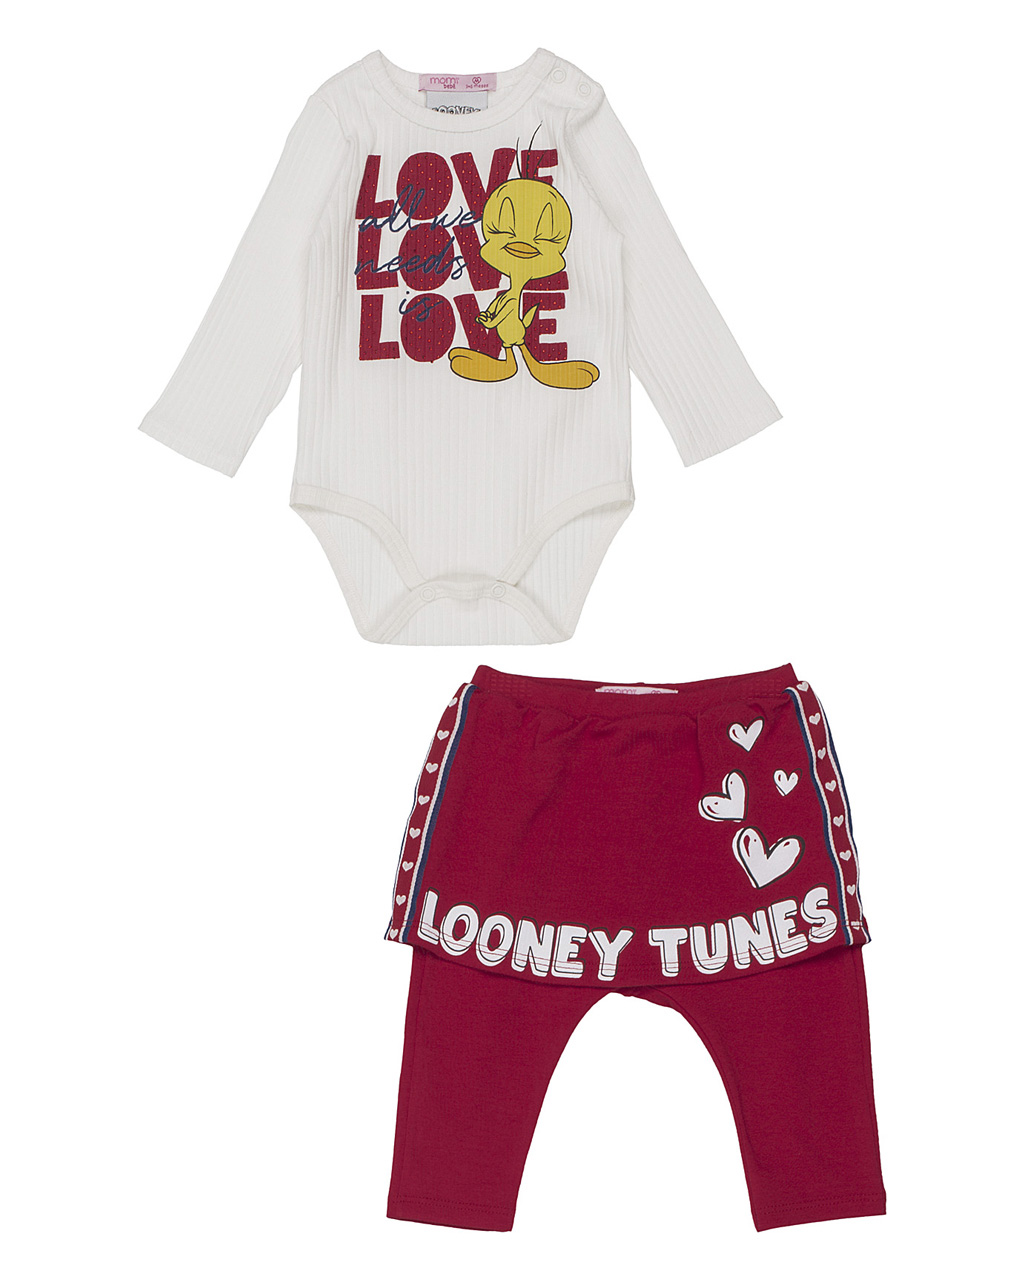 Conjunto Baby Body Canelado Piu Piu E Saia Legging Looney Tunes Momi